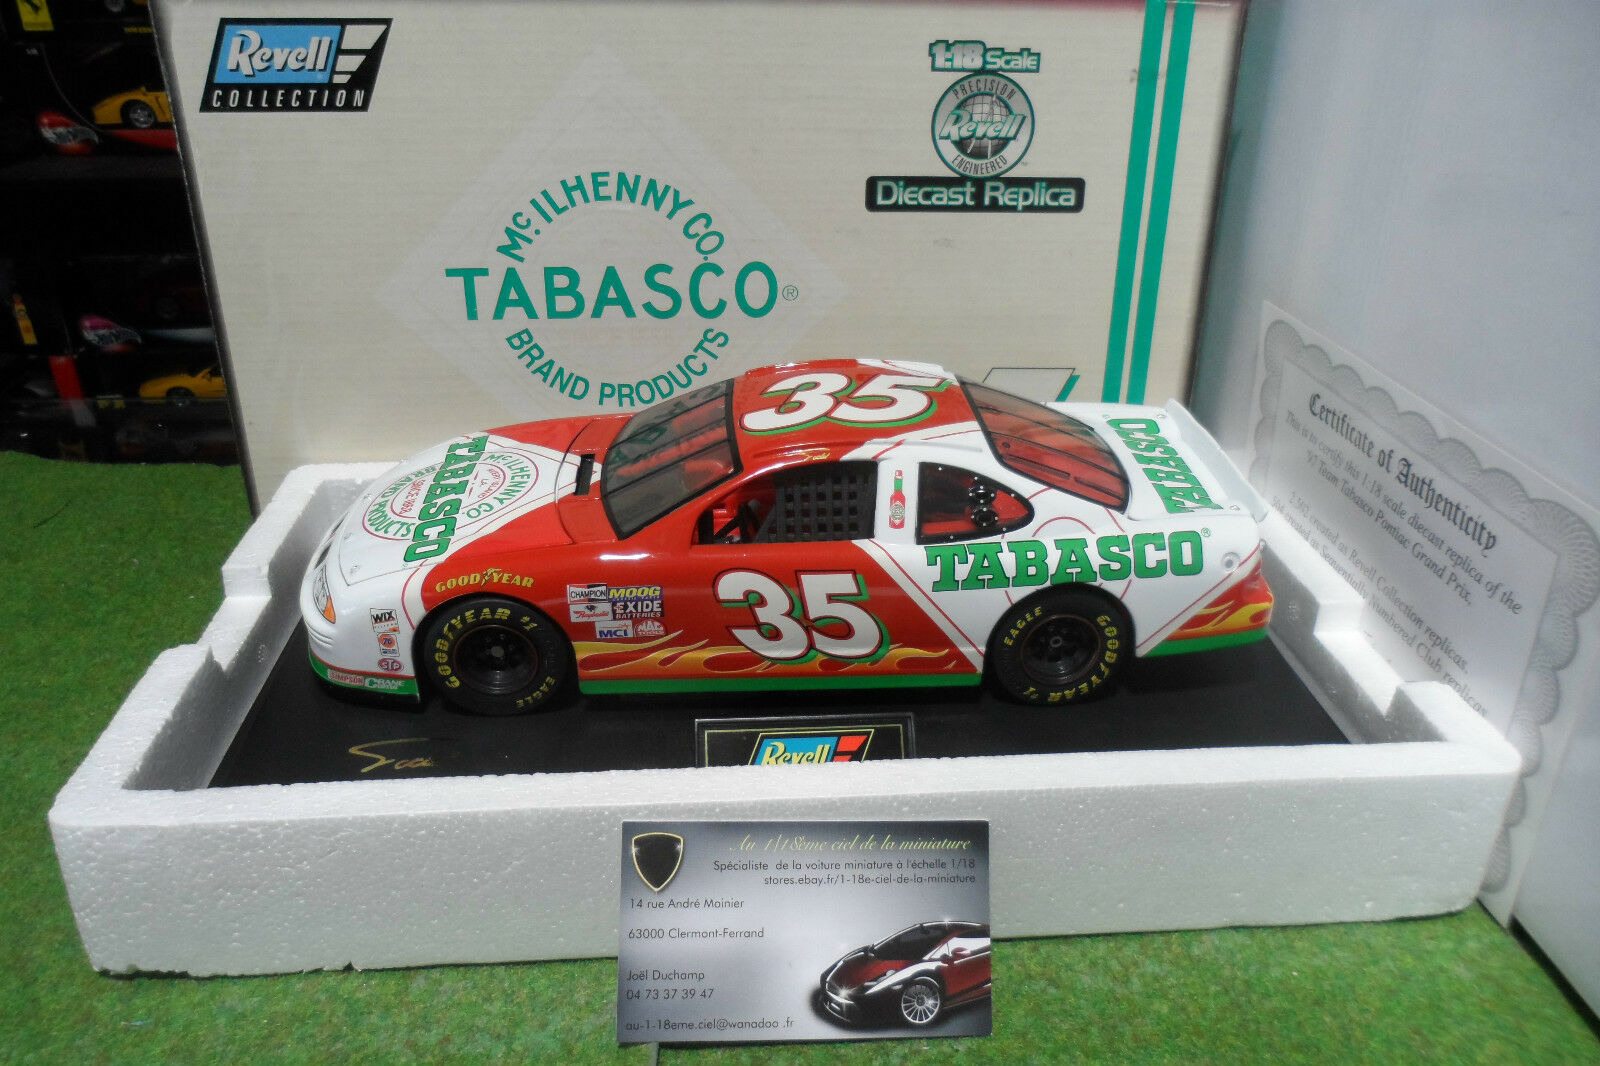 PONTIAC GRAND PRIX  35 NASCAR 1997 TEAM TABASCO RACING 1 18 REVELL 4233 voiture